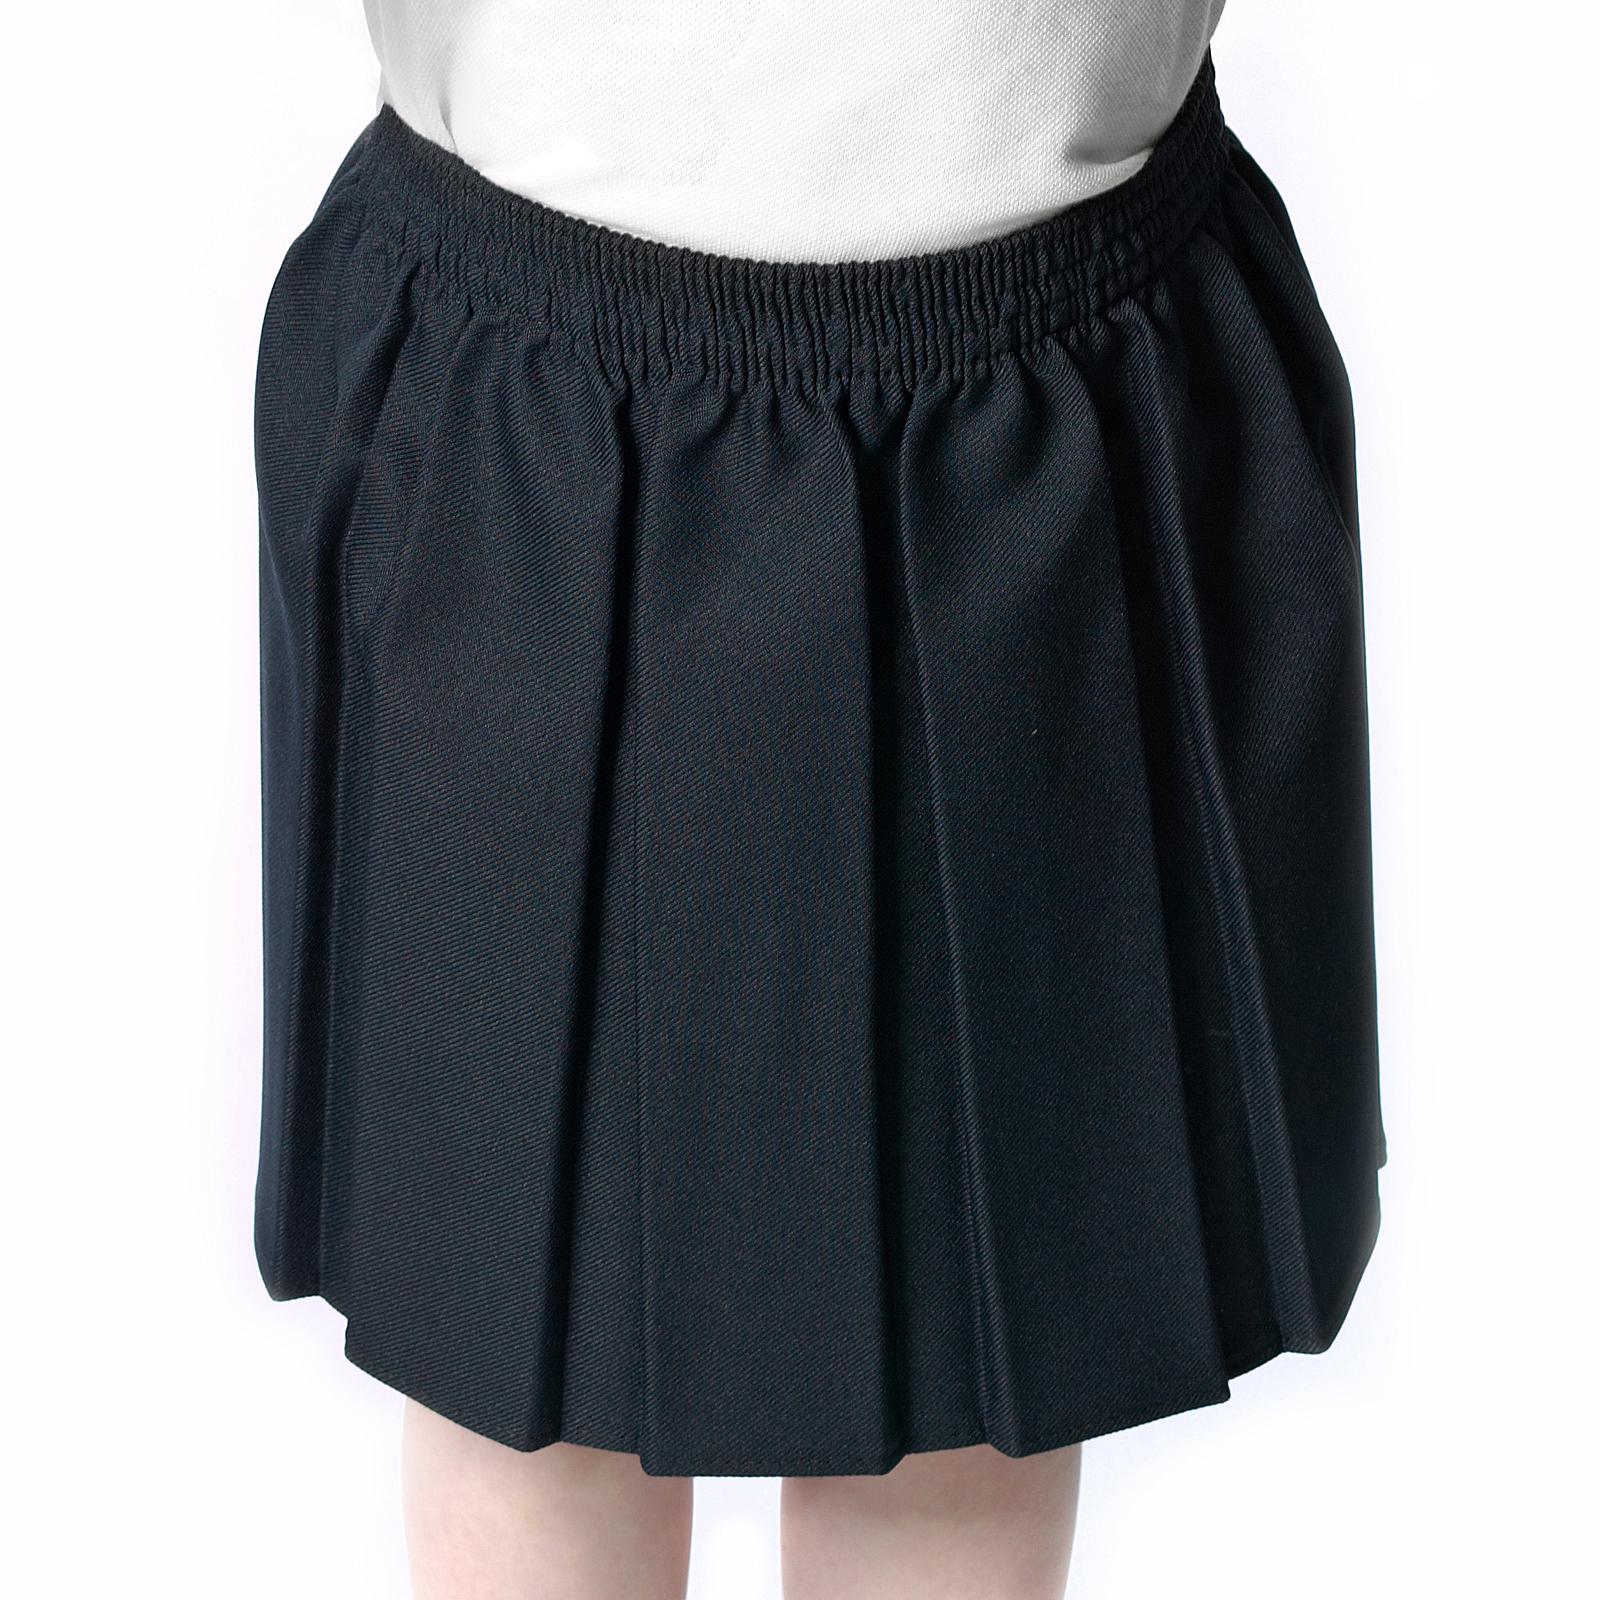 Sunny Fashion Girls Dress Khaki School Pleated Skirt Dress. Sold by Sunny Fashion. $ - $ Sunny Fashion Girls Dress Khaki School Pleated Skirt Dress. Sold by Sunny Fashion. $ $ Cookie's Brand Girls' Box Pleat Skirt - khaki, Sold by CookiesKids. $ $